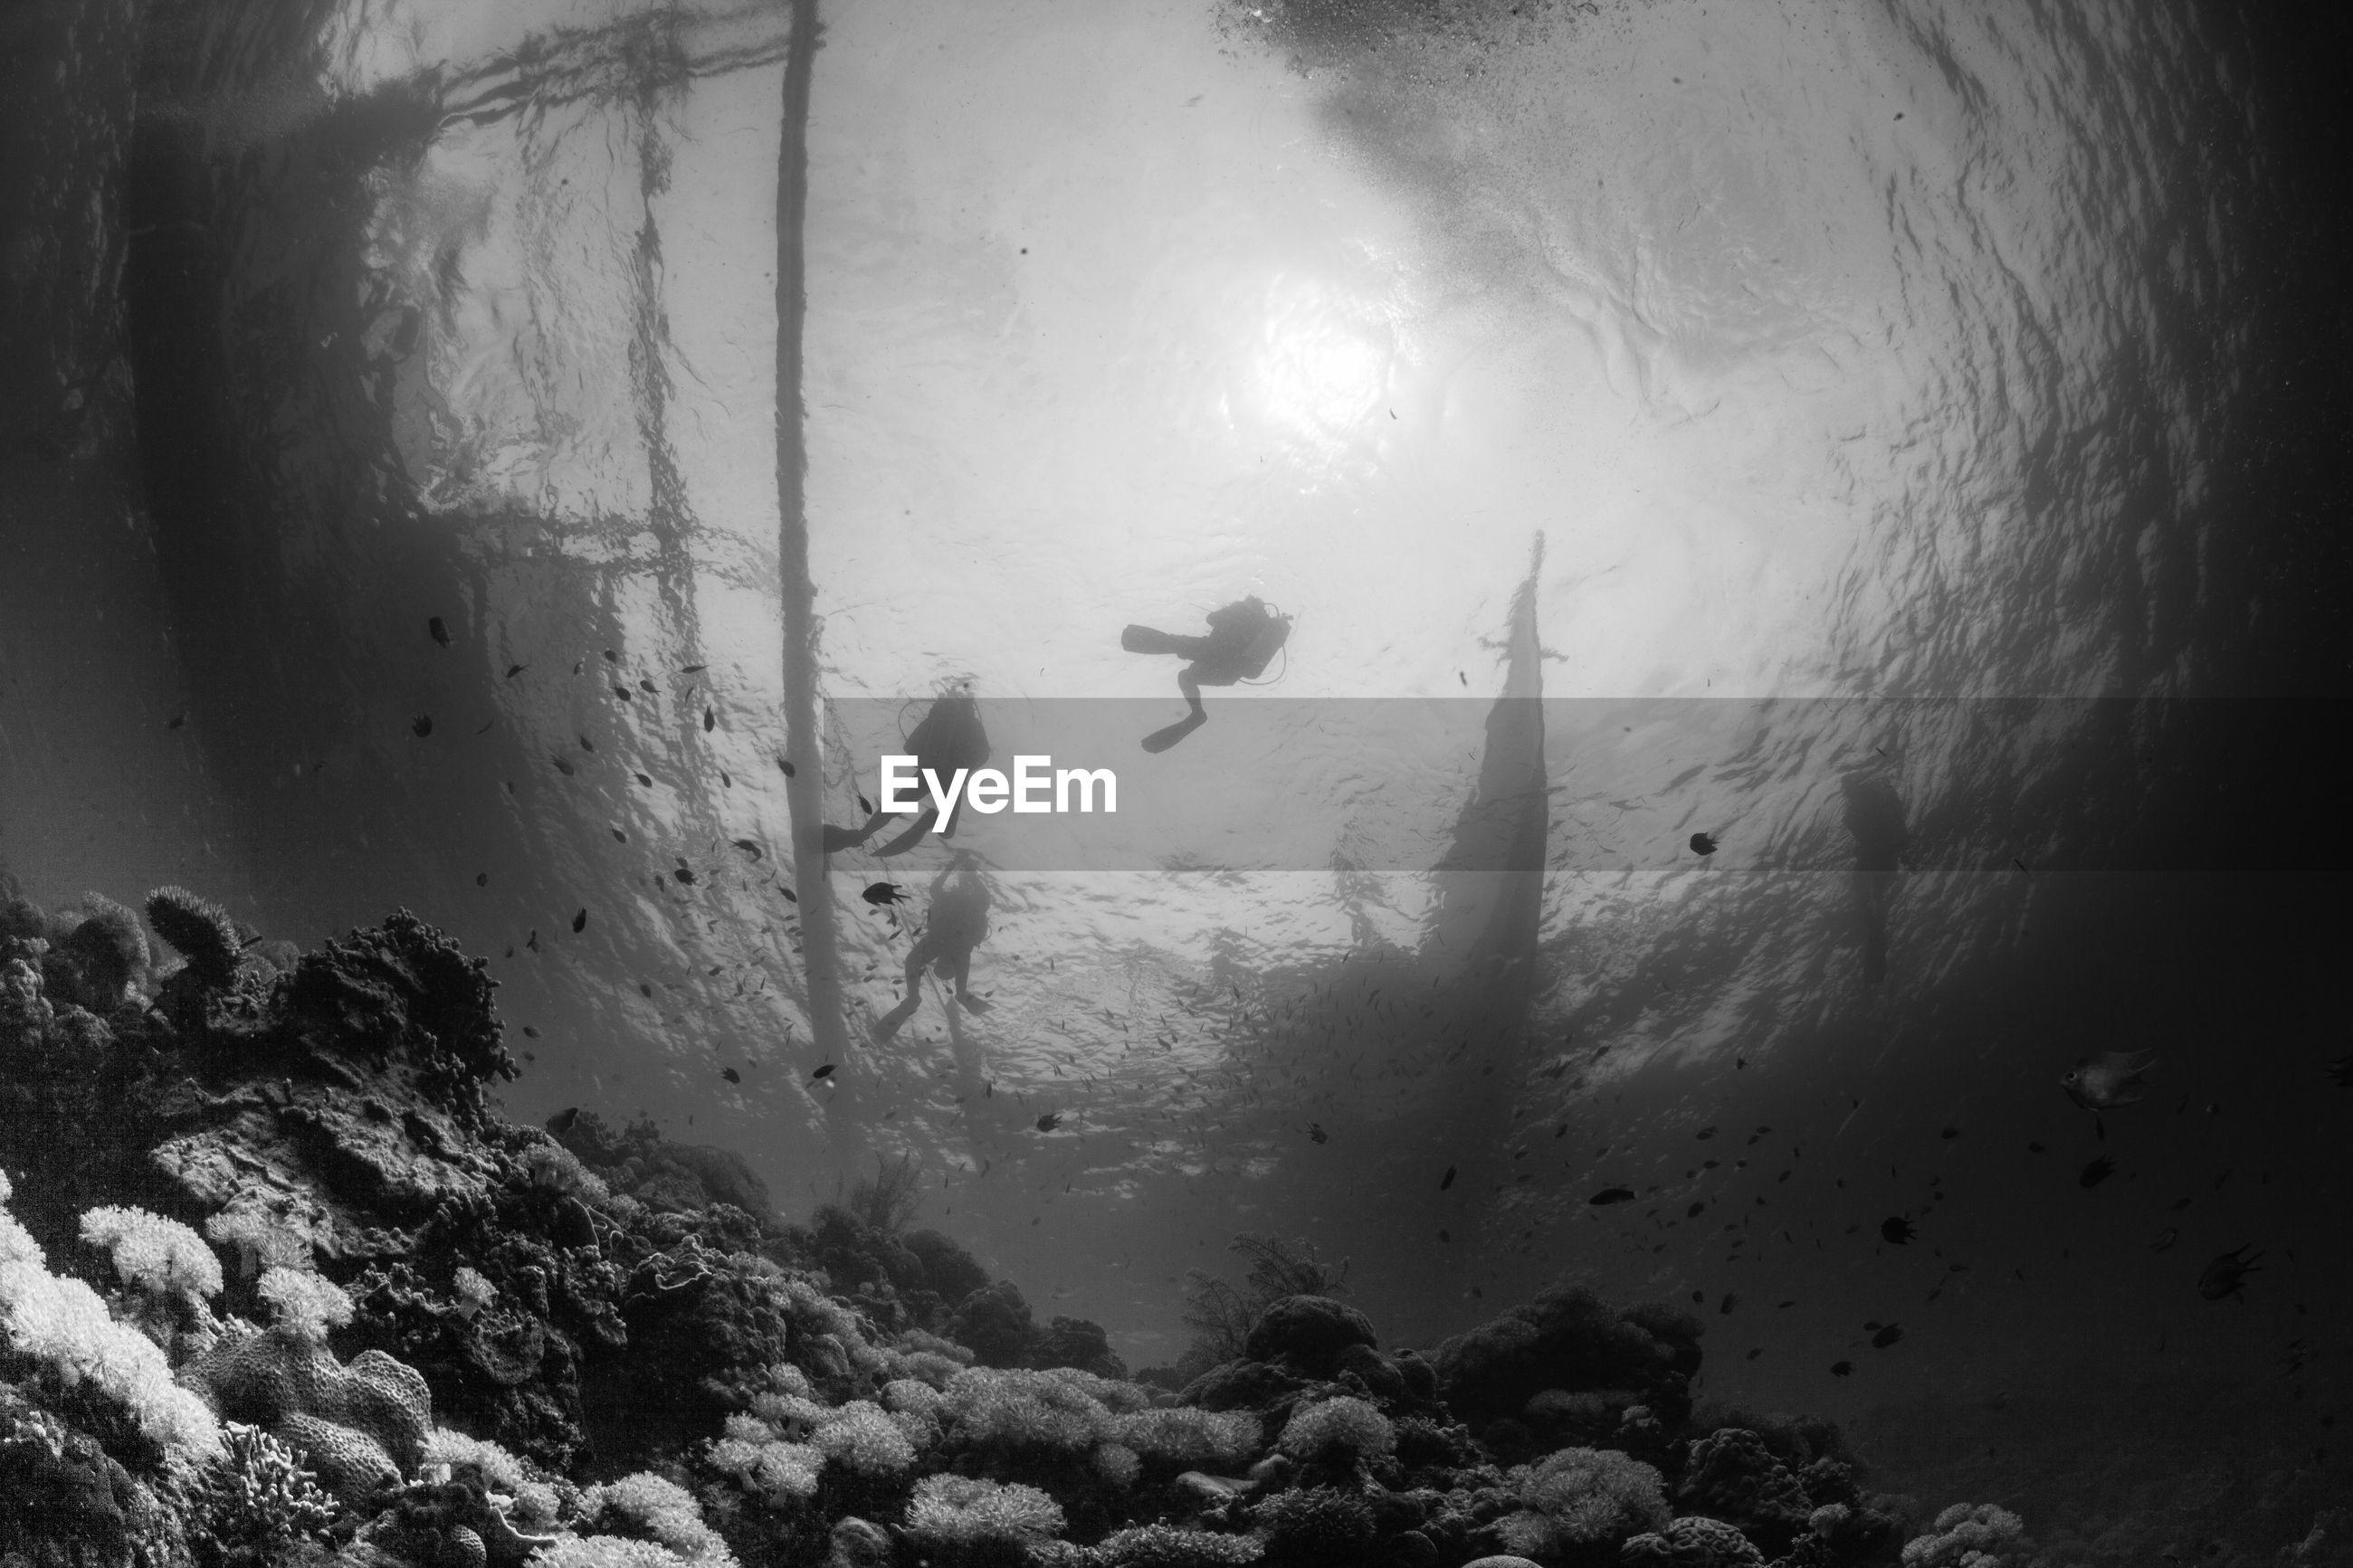 Scuba divers swimming underwater